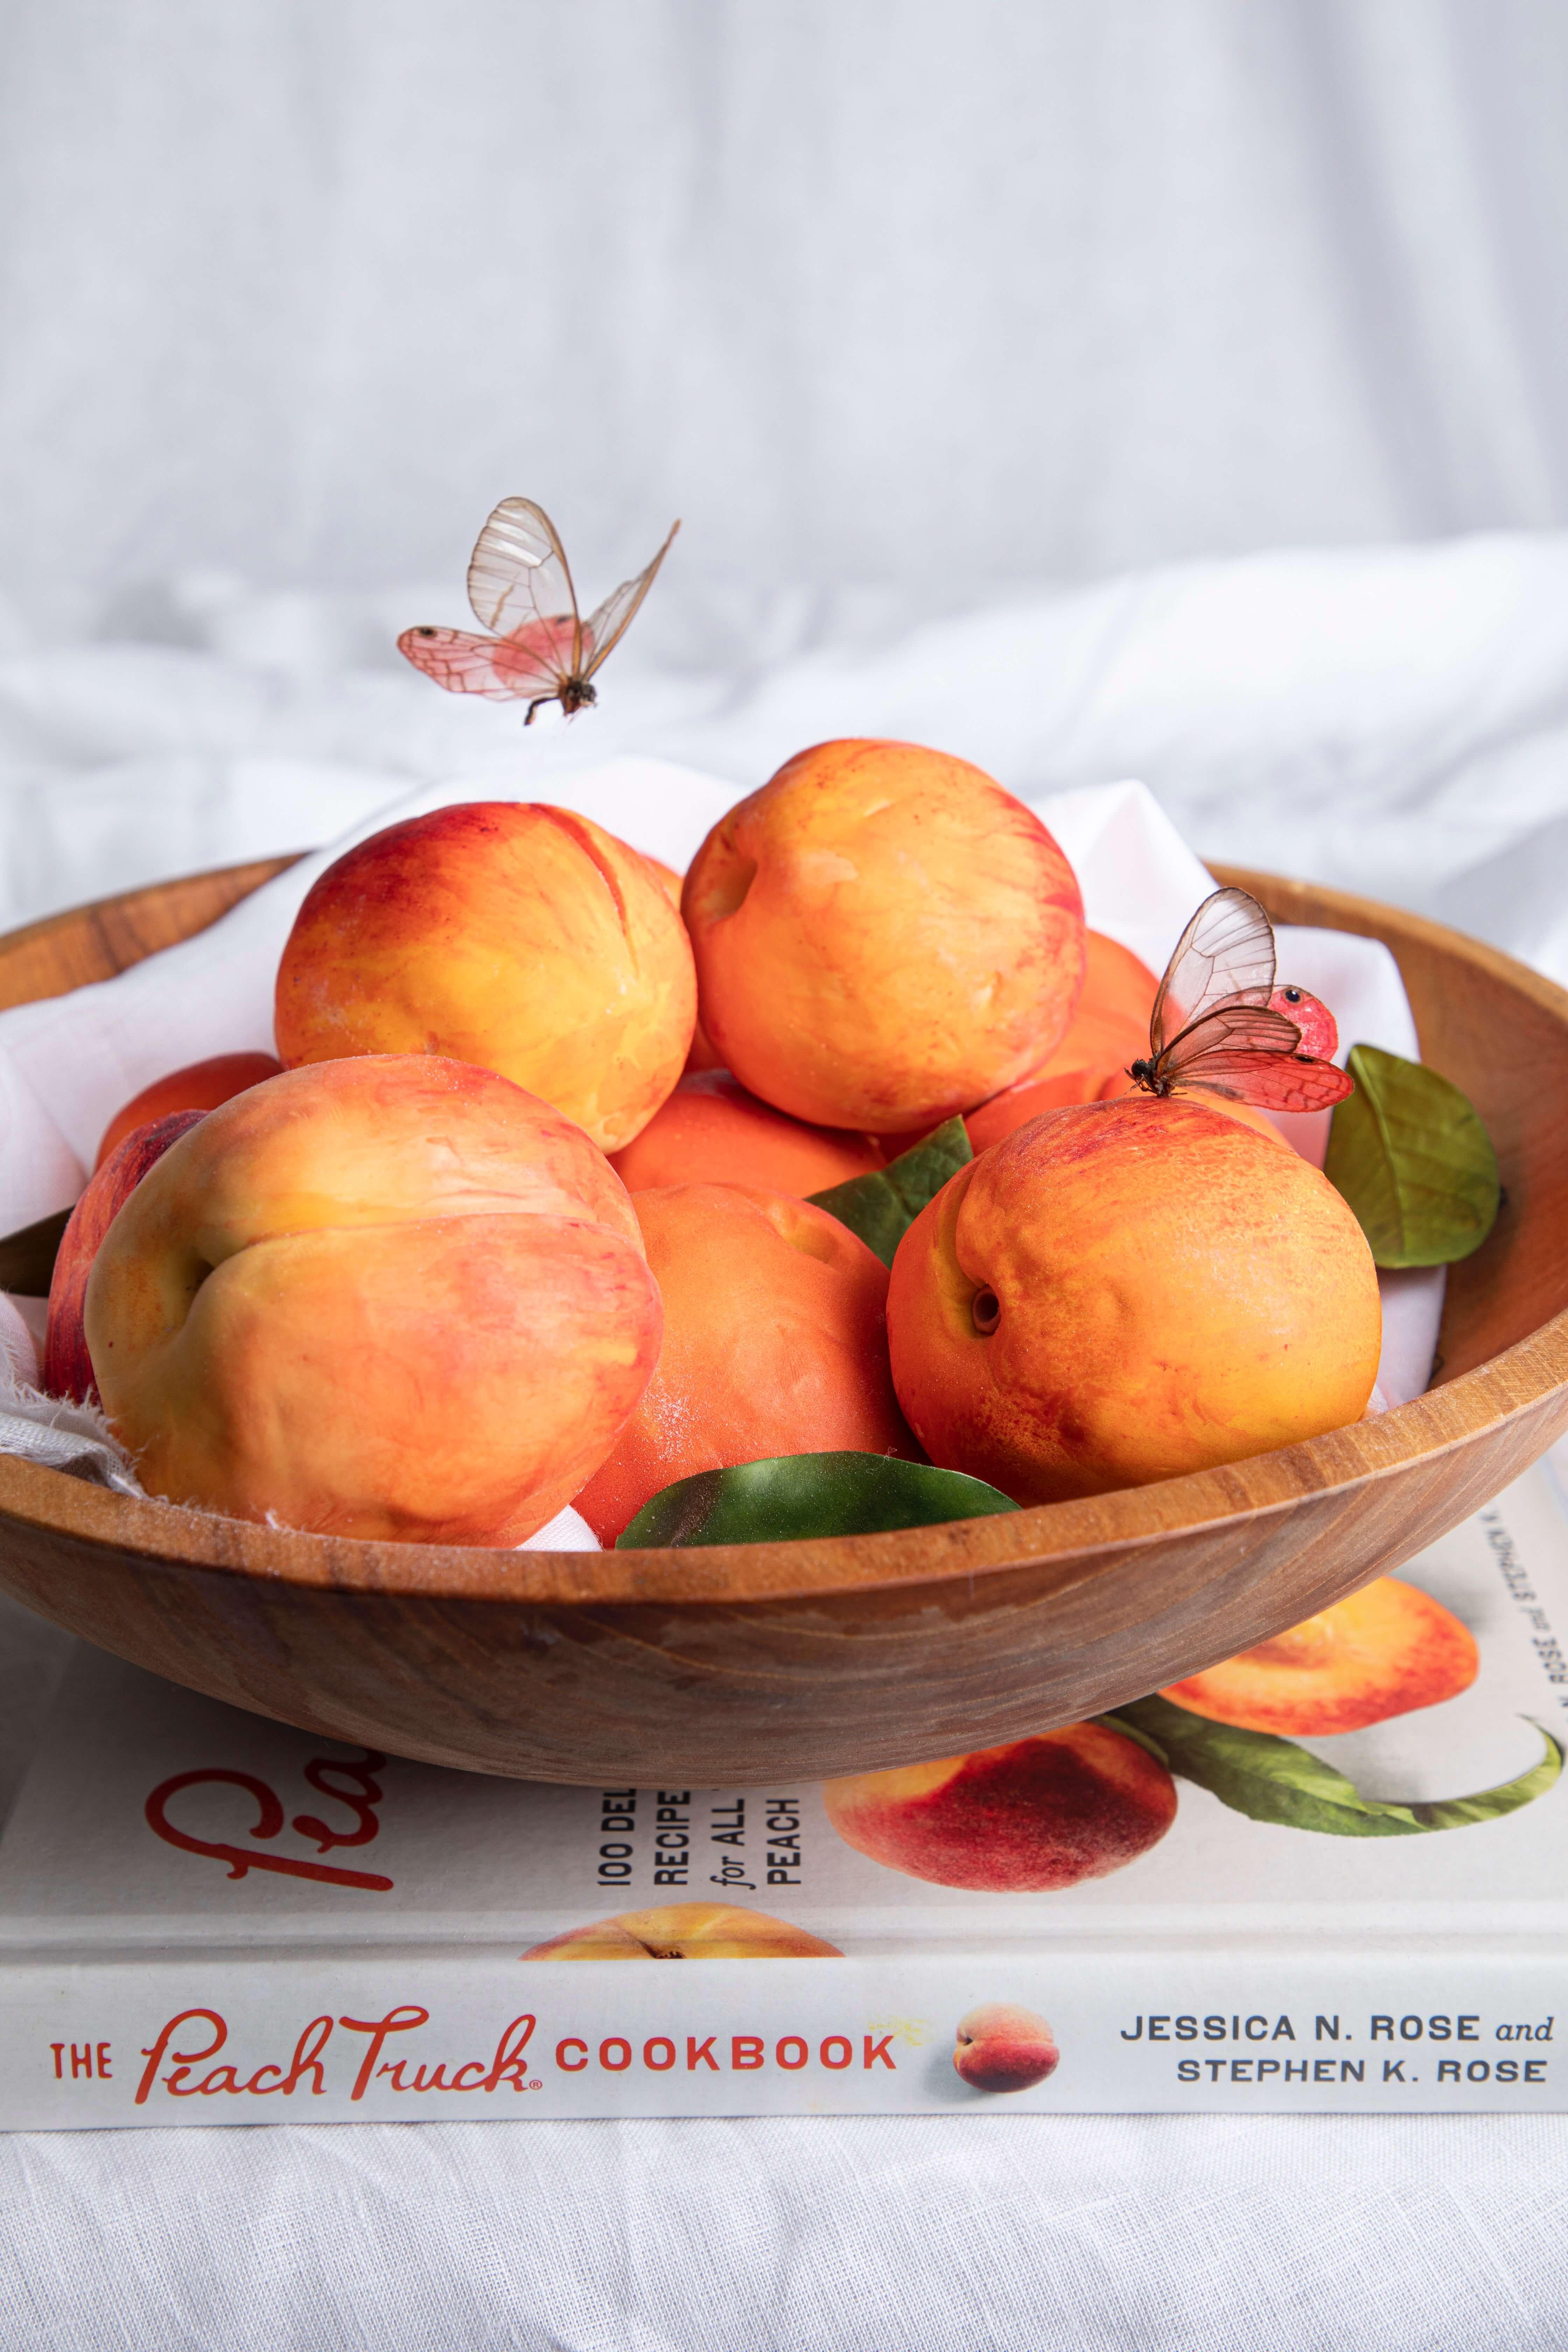 Peach Cakes and Peach Truck Cookbook Brand Cakes